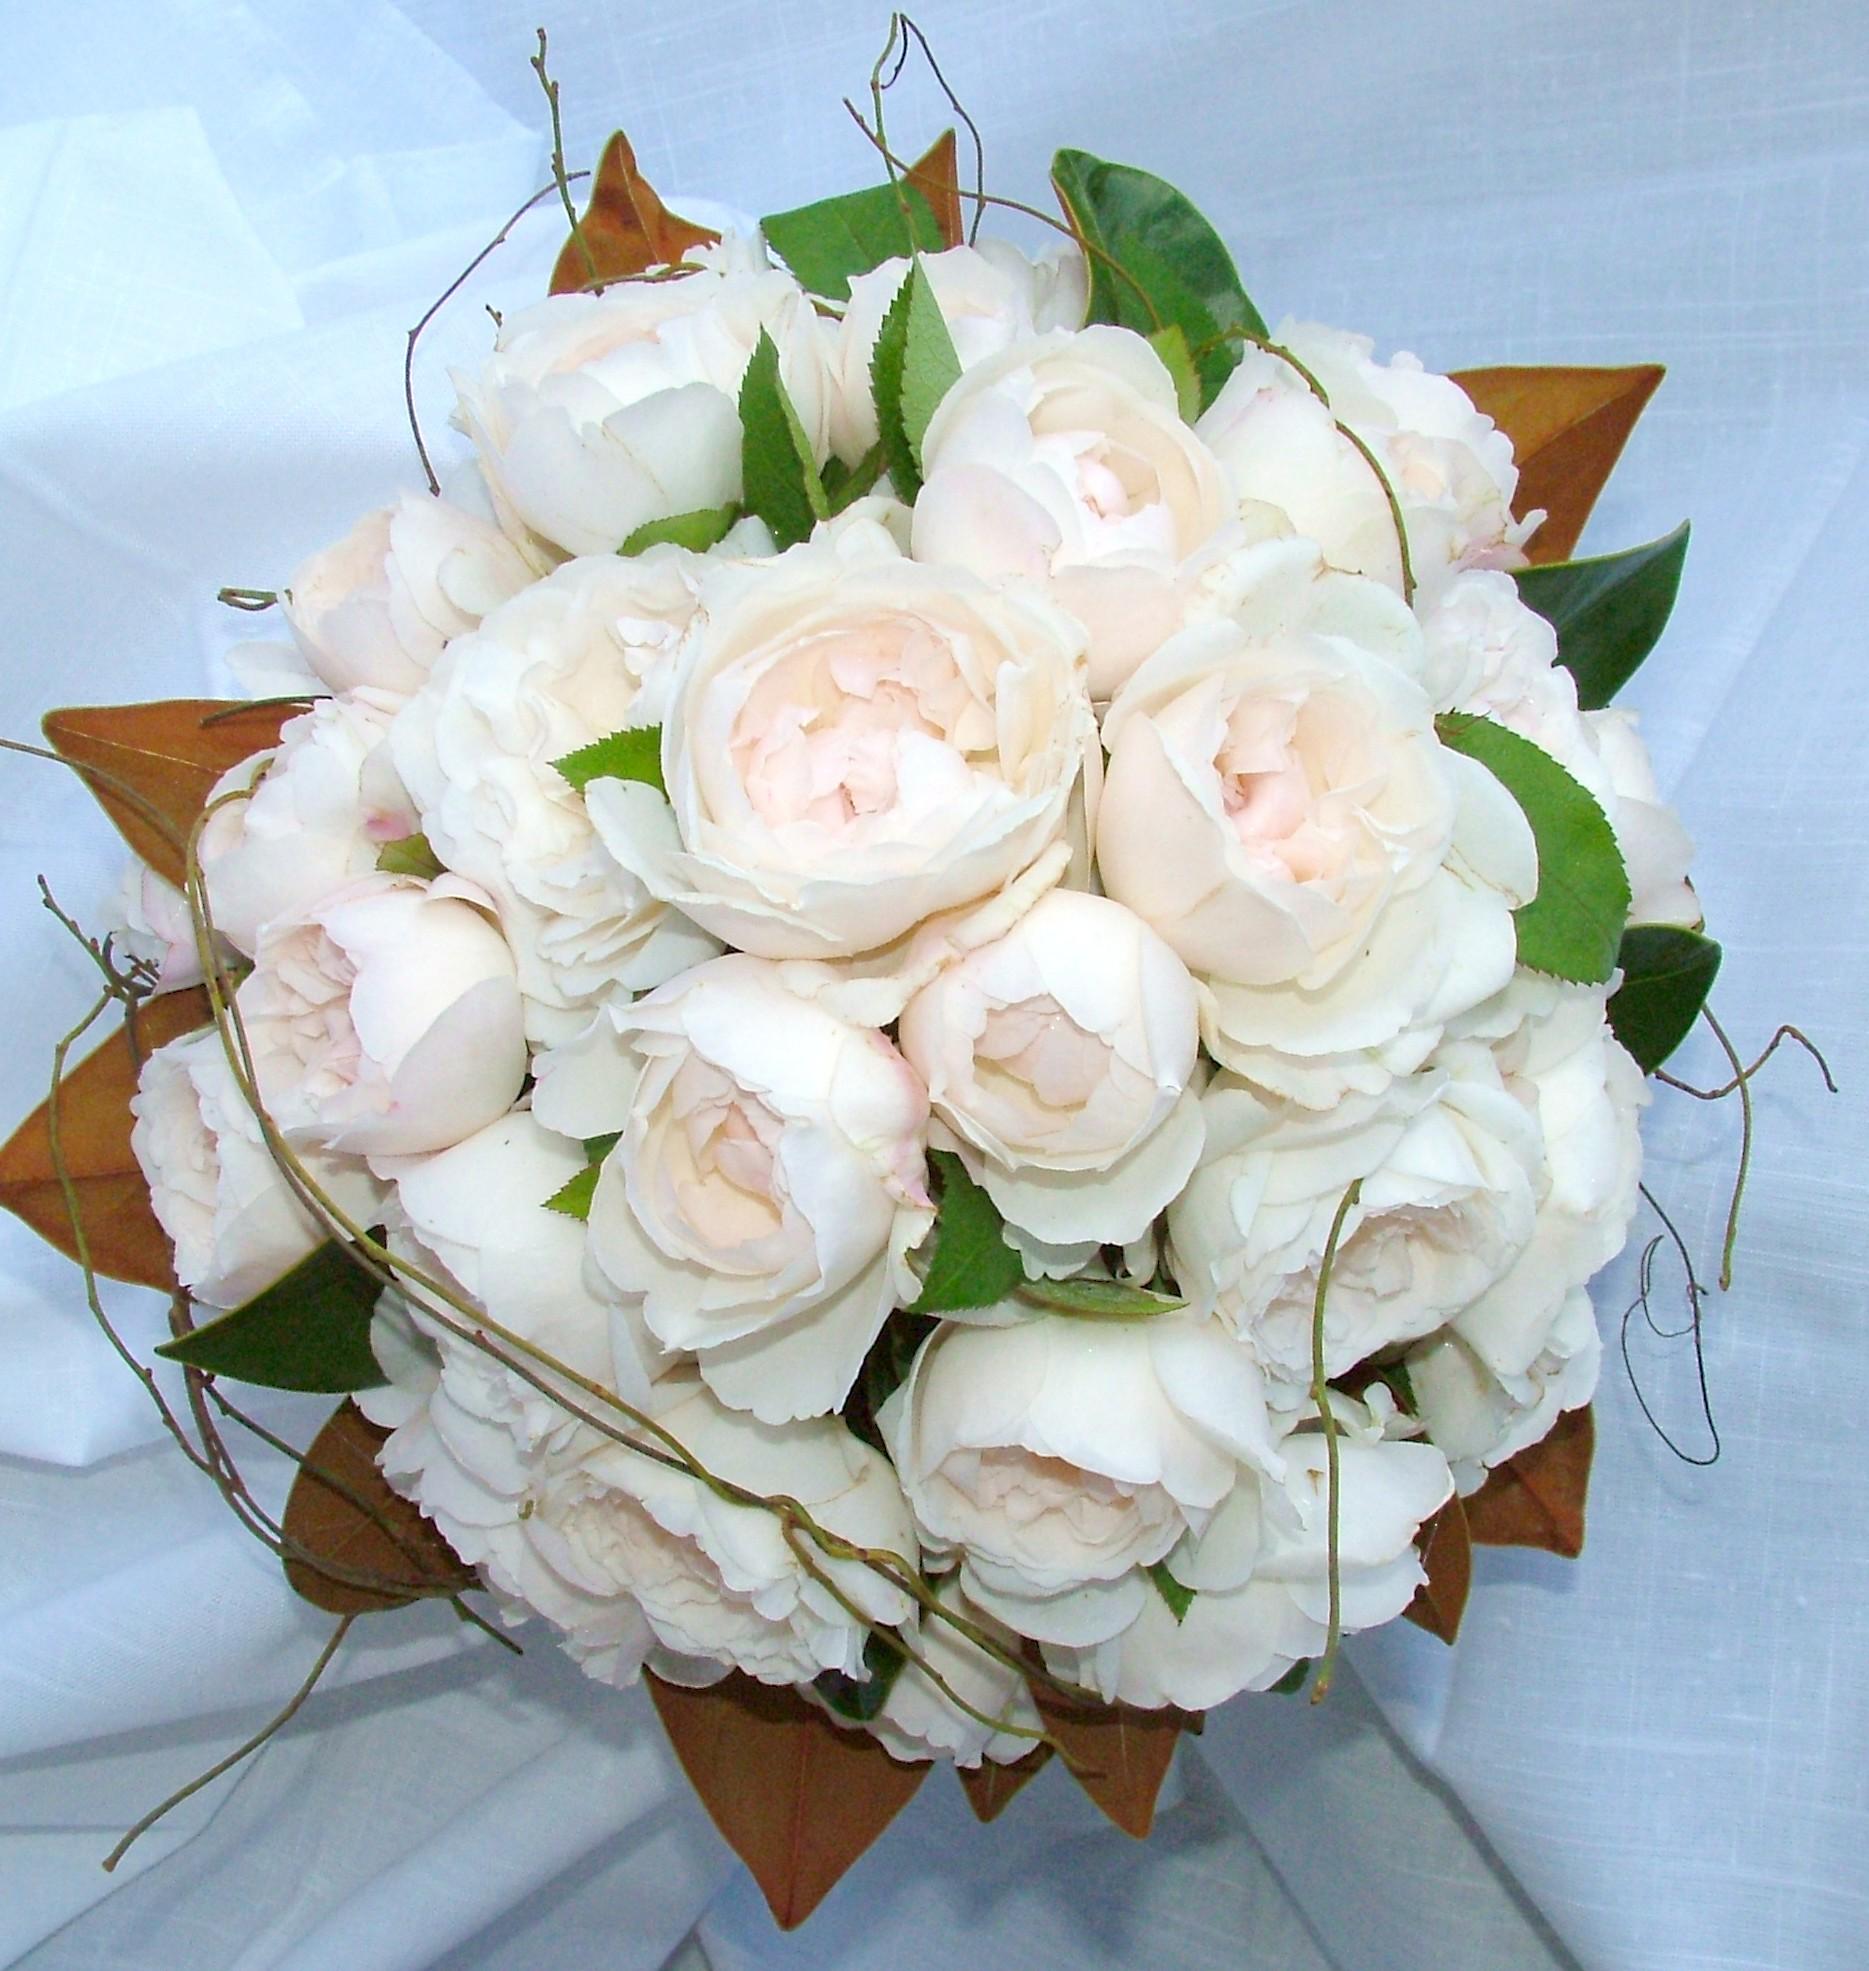 david-austin-roses-blush-pink.jpg